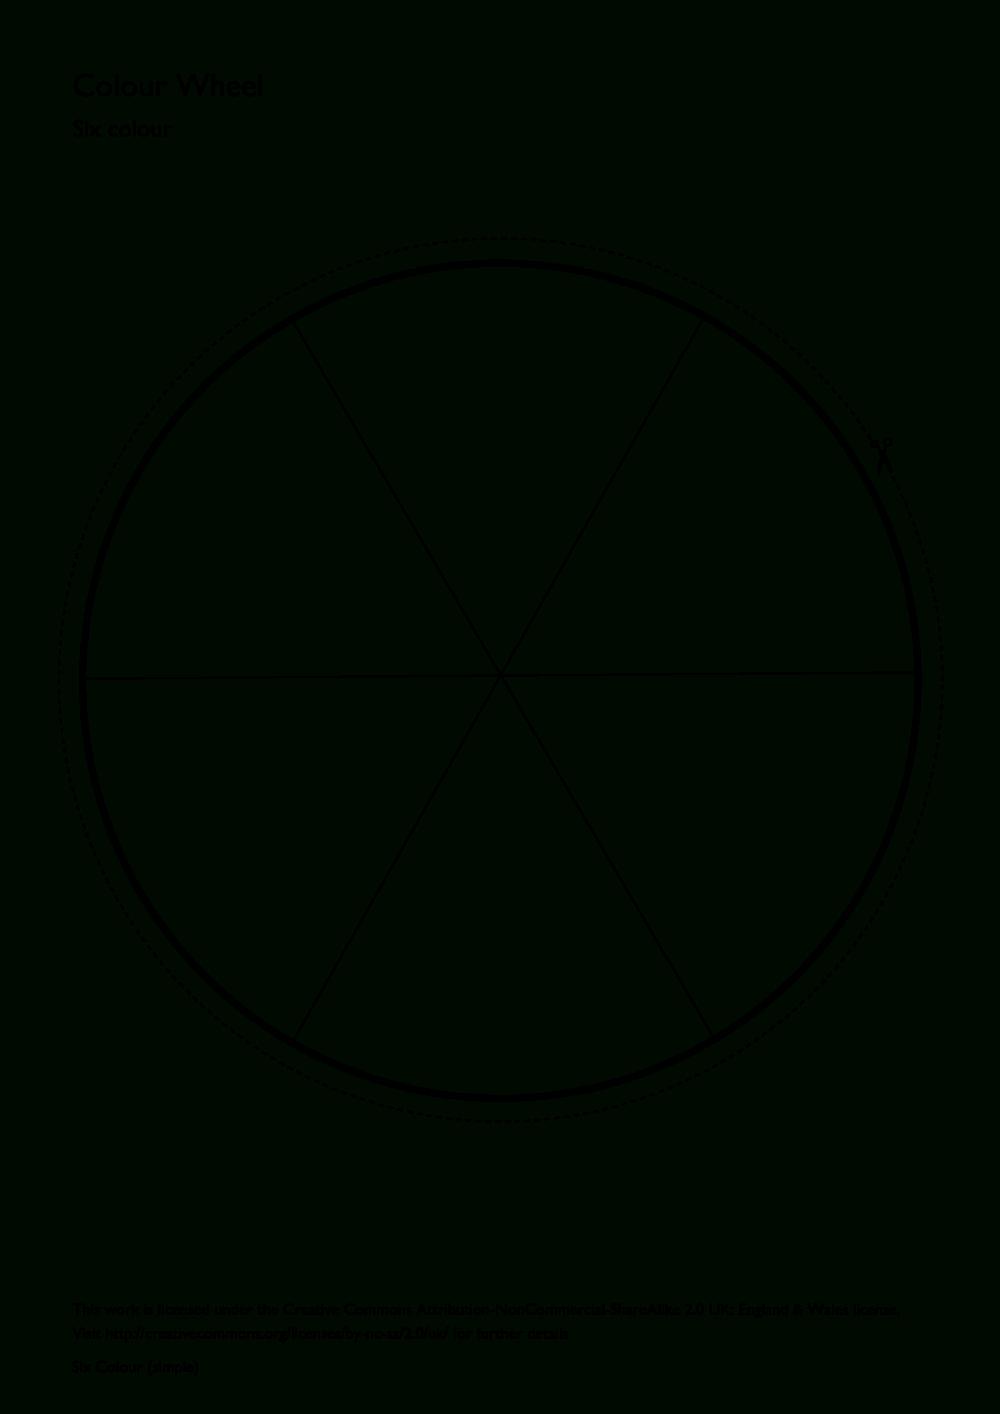 Printable Blank Color Wheel - Google Search | 1St | Color Wheel Art | Printable Color Wheel Worksheet